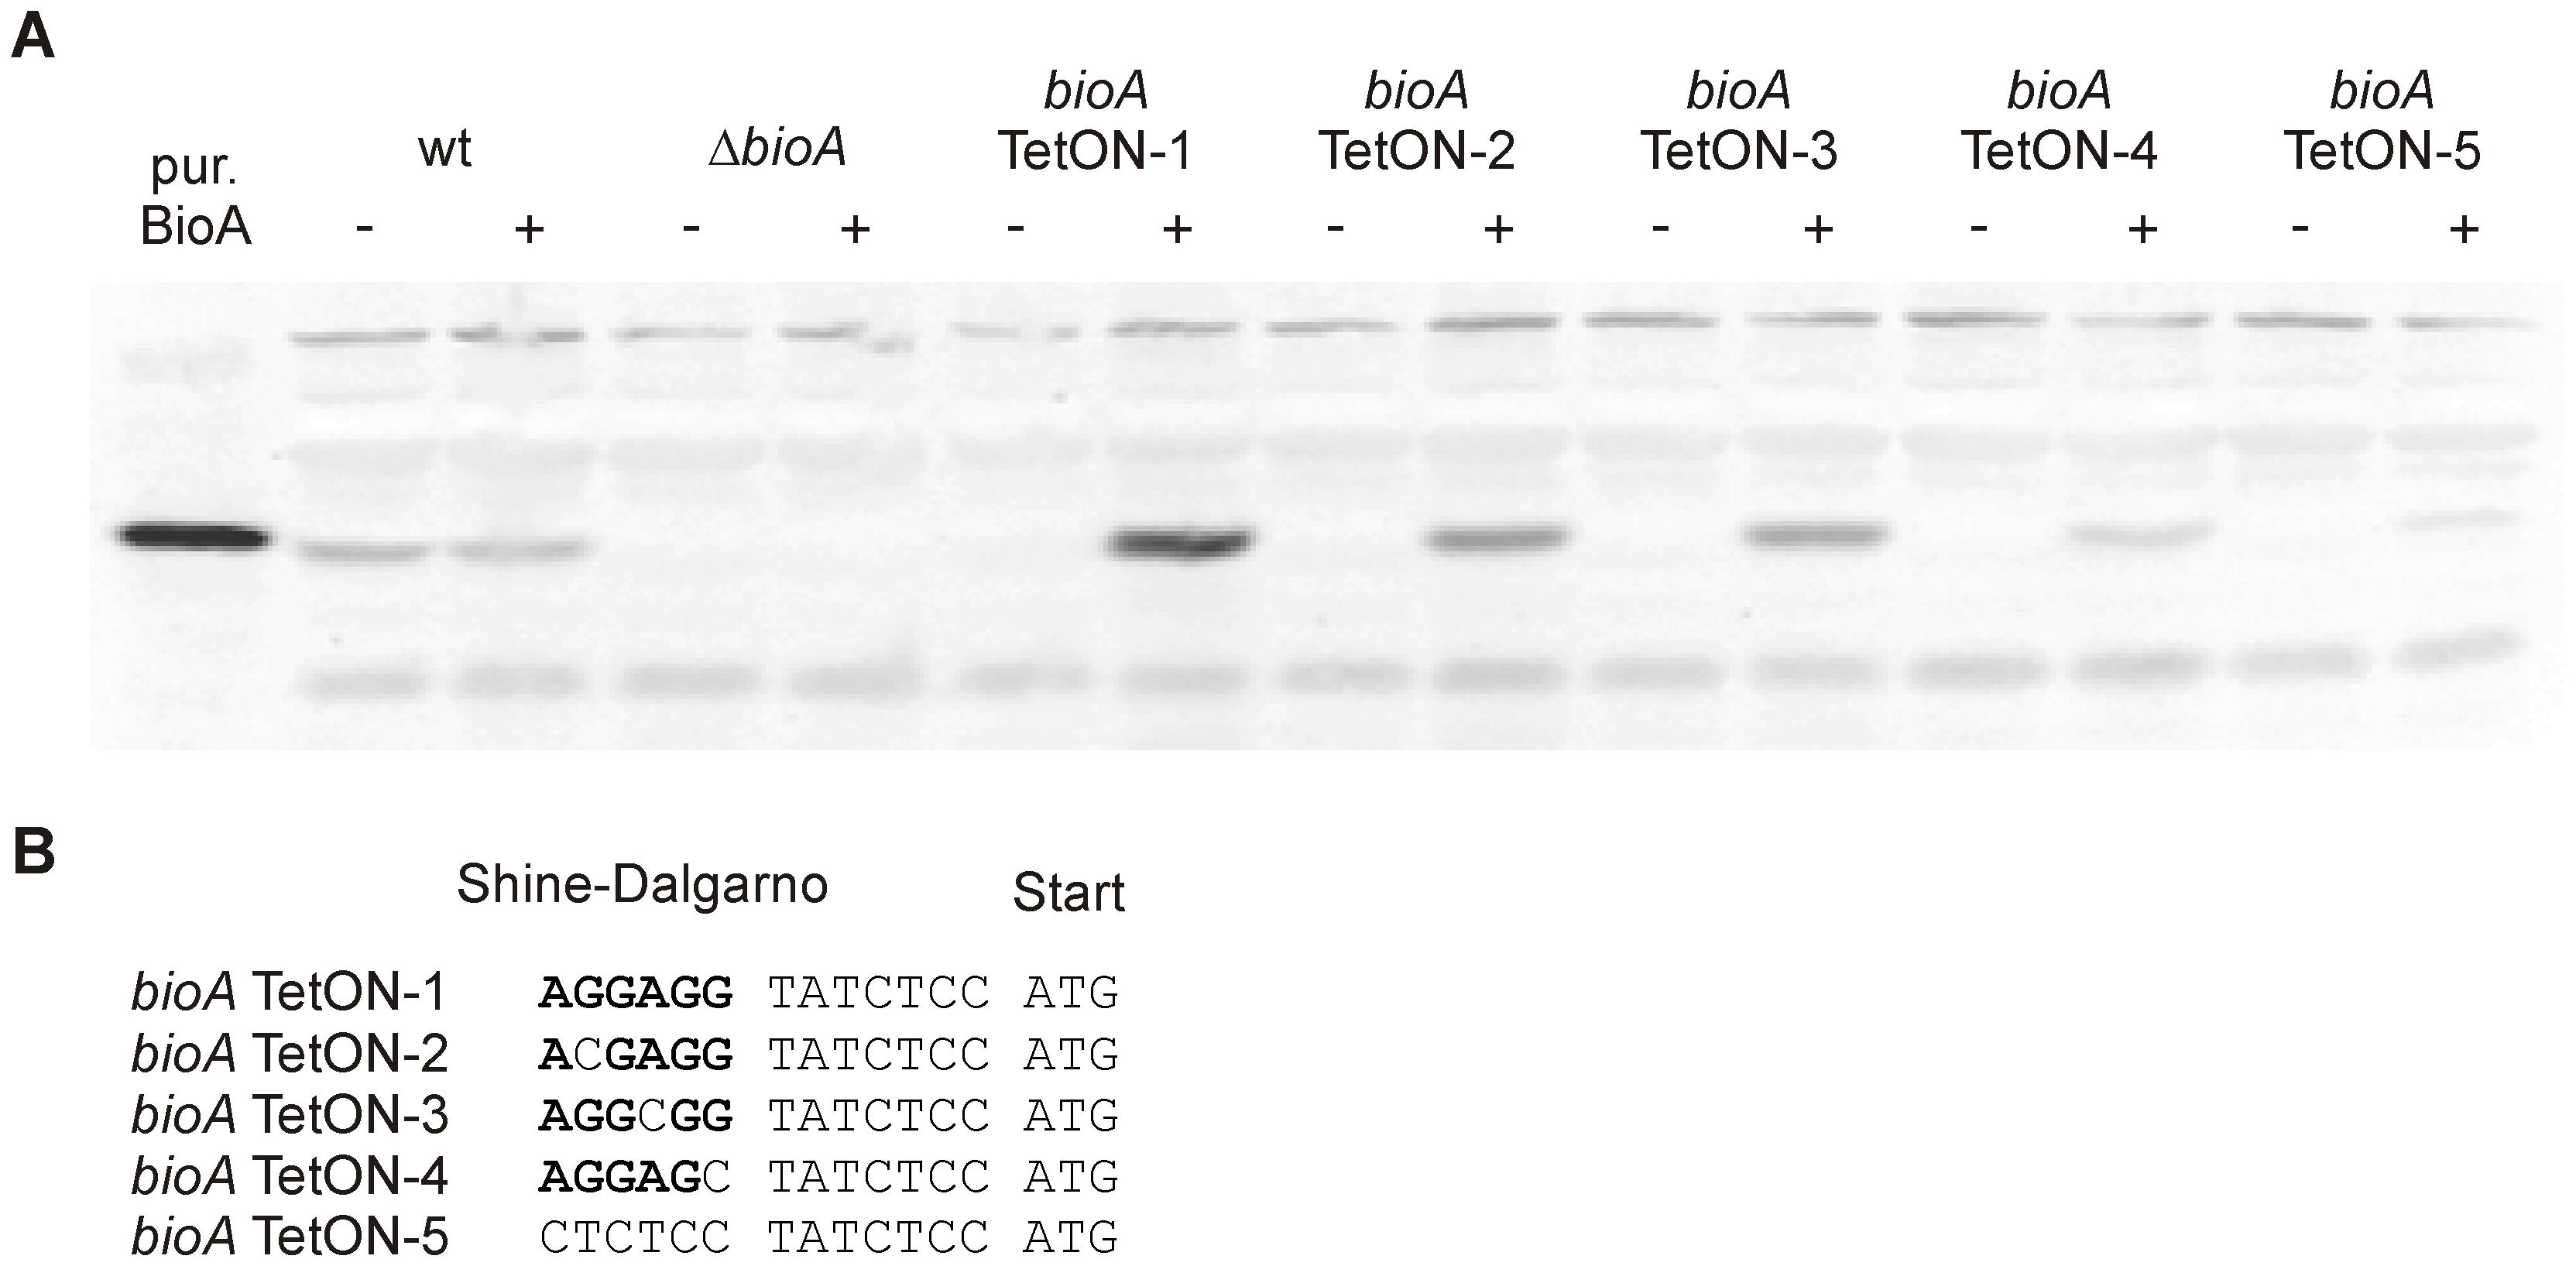 BioA protein levels of wt <i>Mtb</i>, <i>ΔbioA</i>, and <i>bioA</i> TetON mutants.